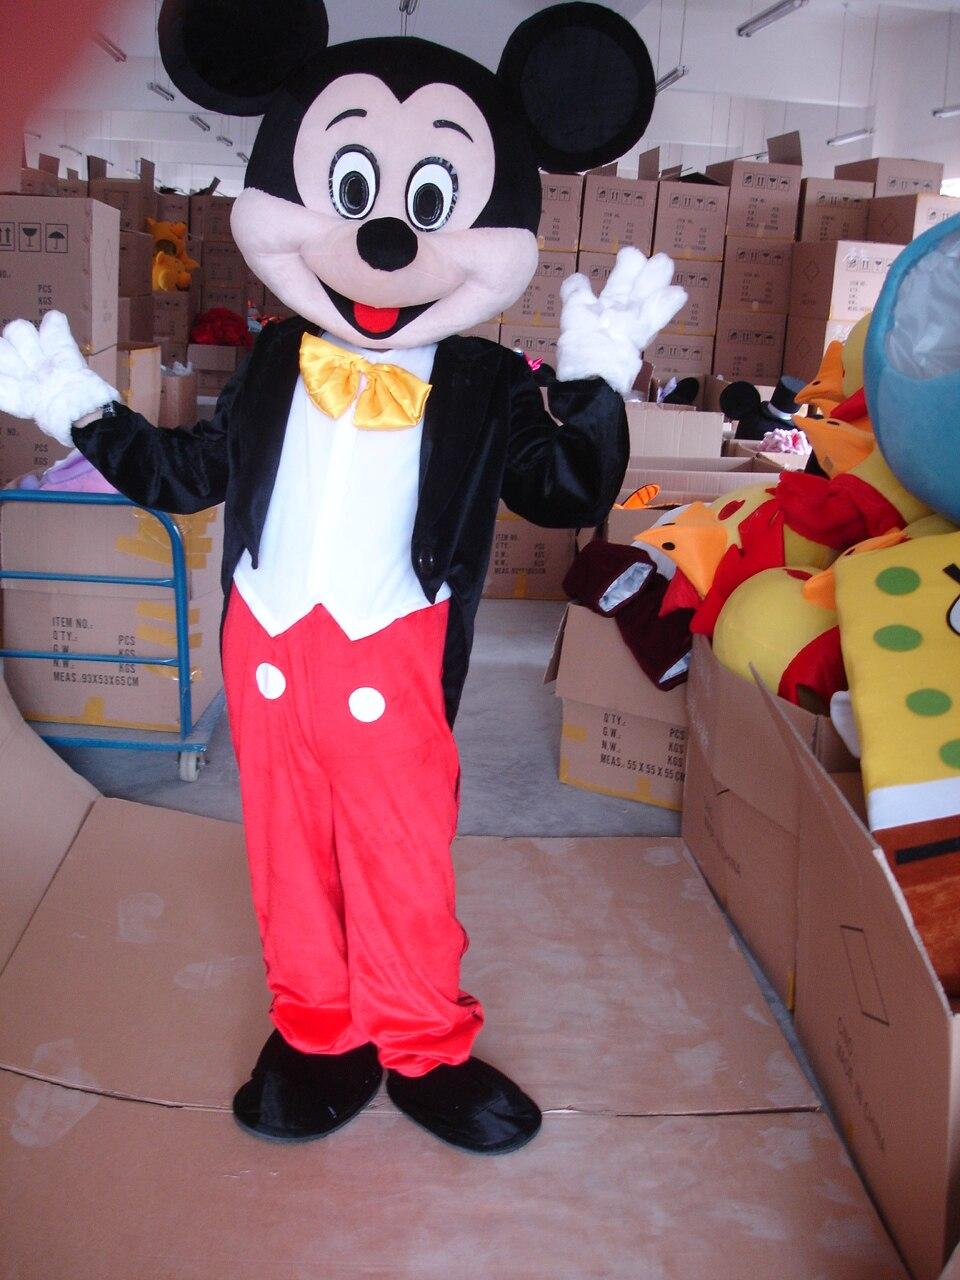 hot sale 2015 cartoon character adult cute mouse mascot. Black Bedroom Furniture Sets. Home Design Ideas